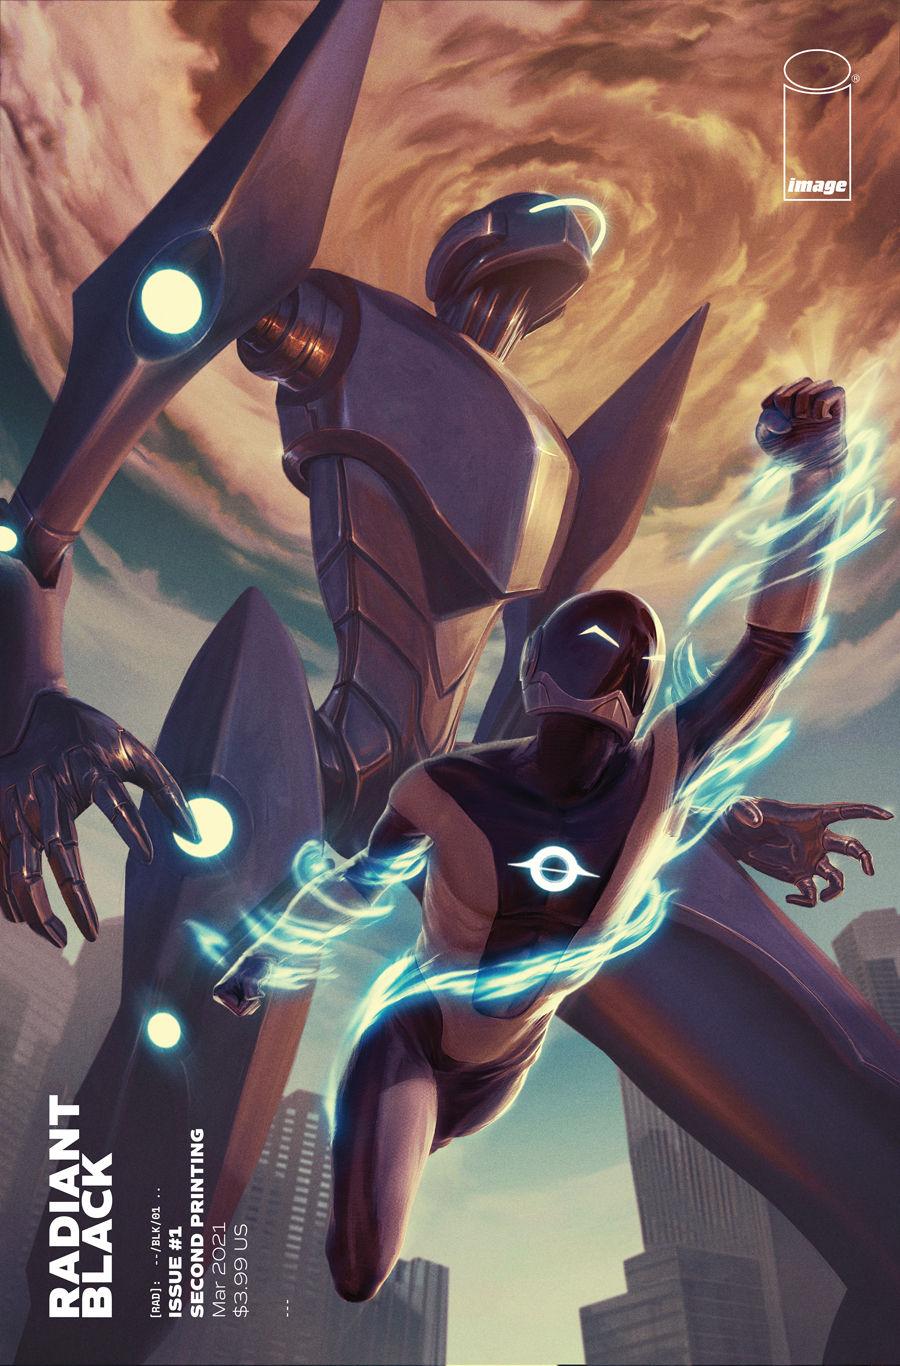 RB01-cvr-SecondPrinting-Datolli_c6815a0147f8285e3b5042ebb3626151 ComicList: Image Comics New Releases for 03/10/2021